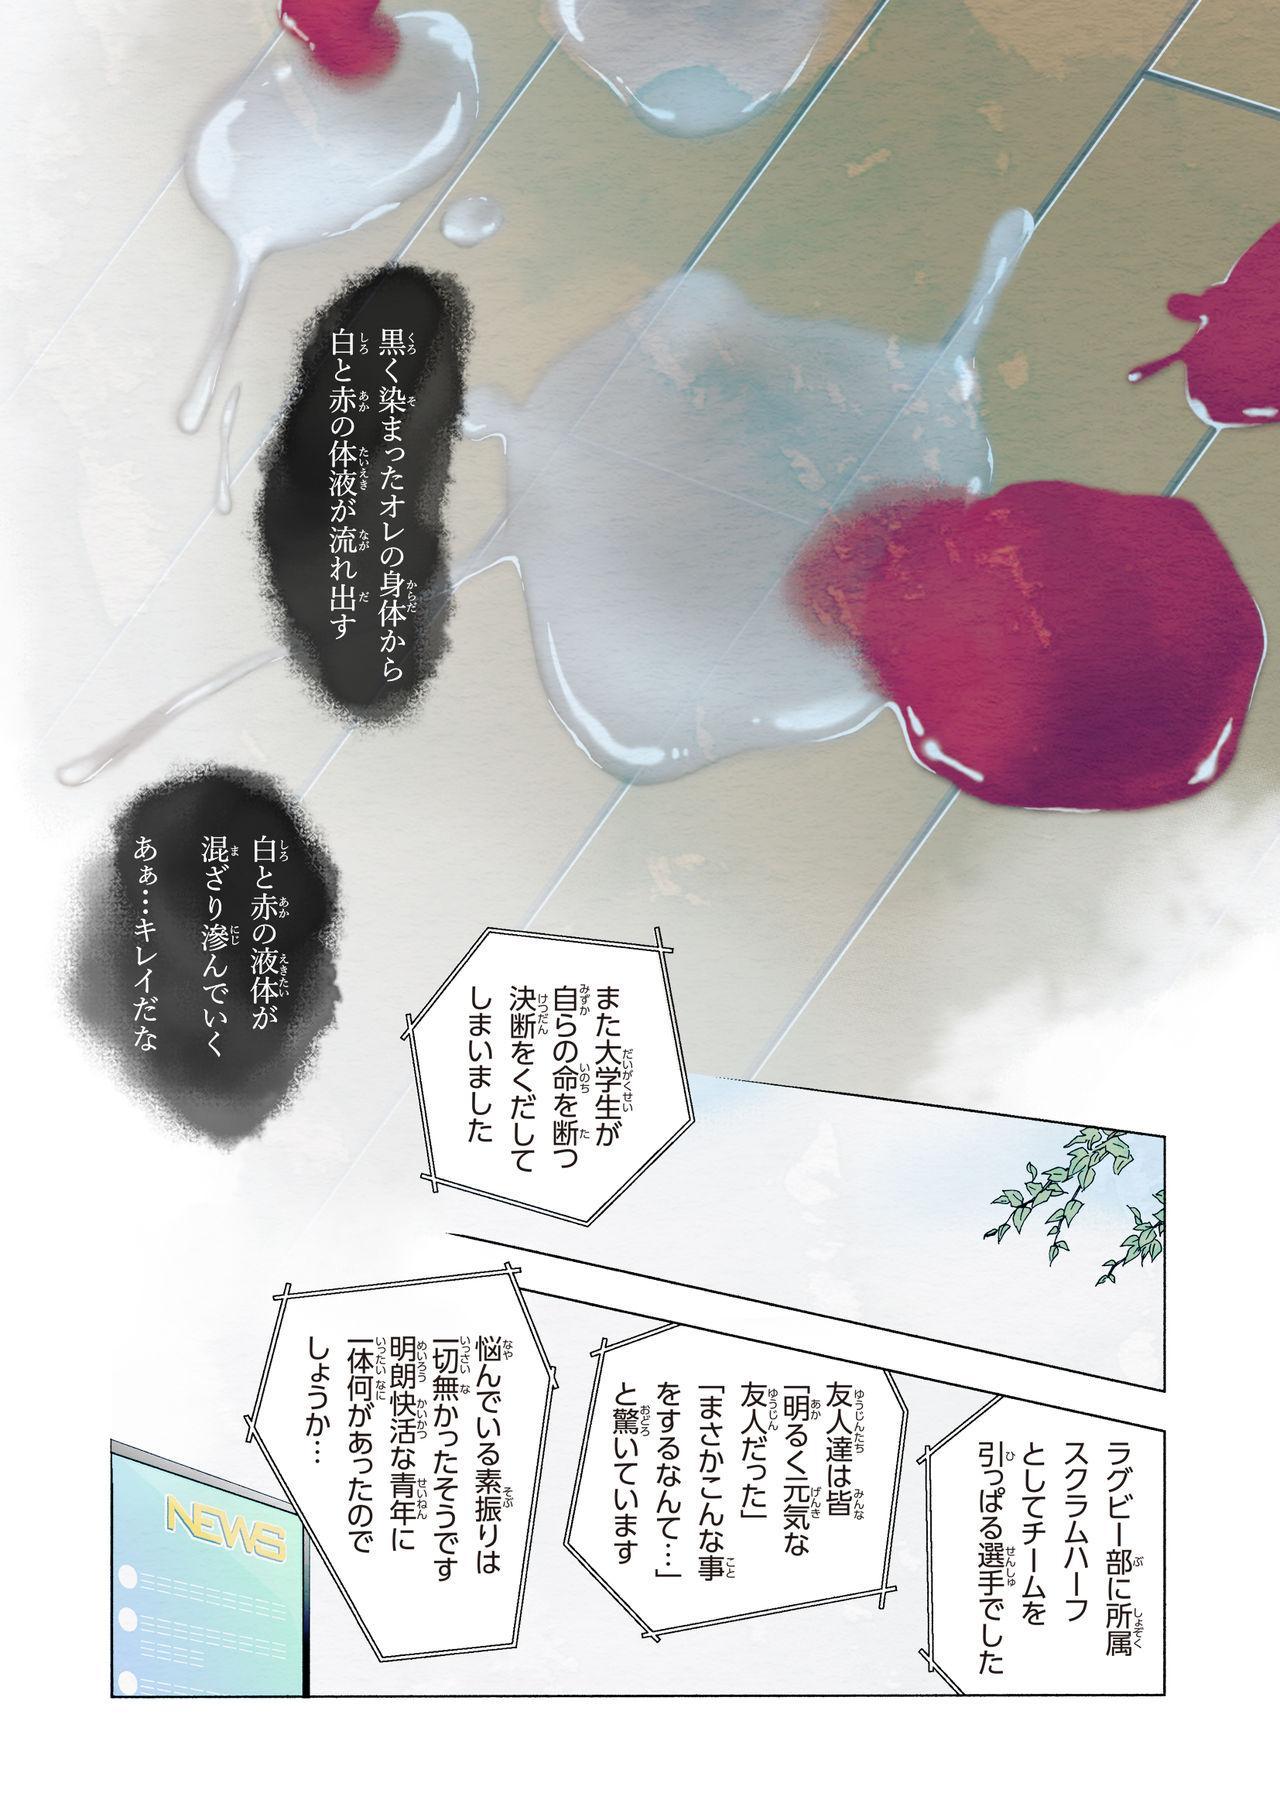 Shimi 24